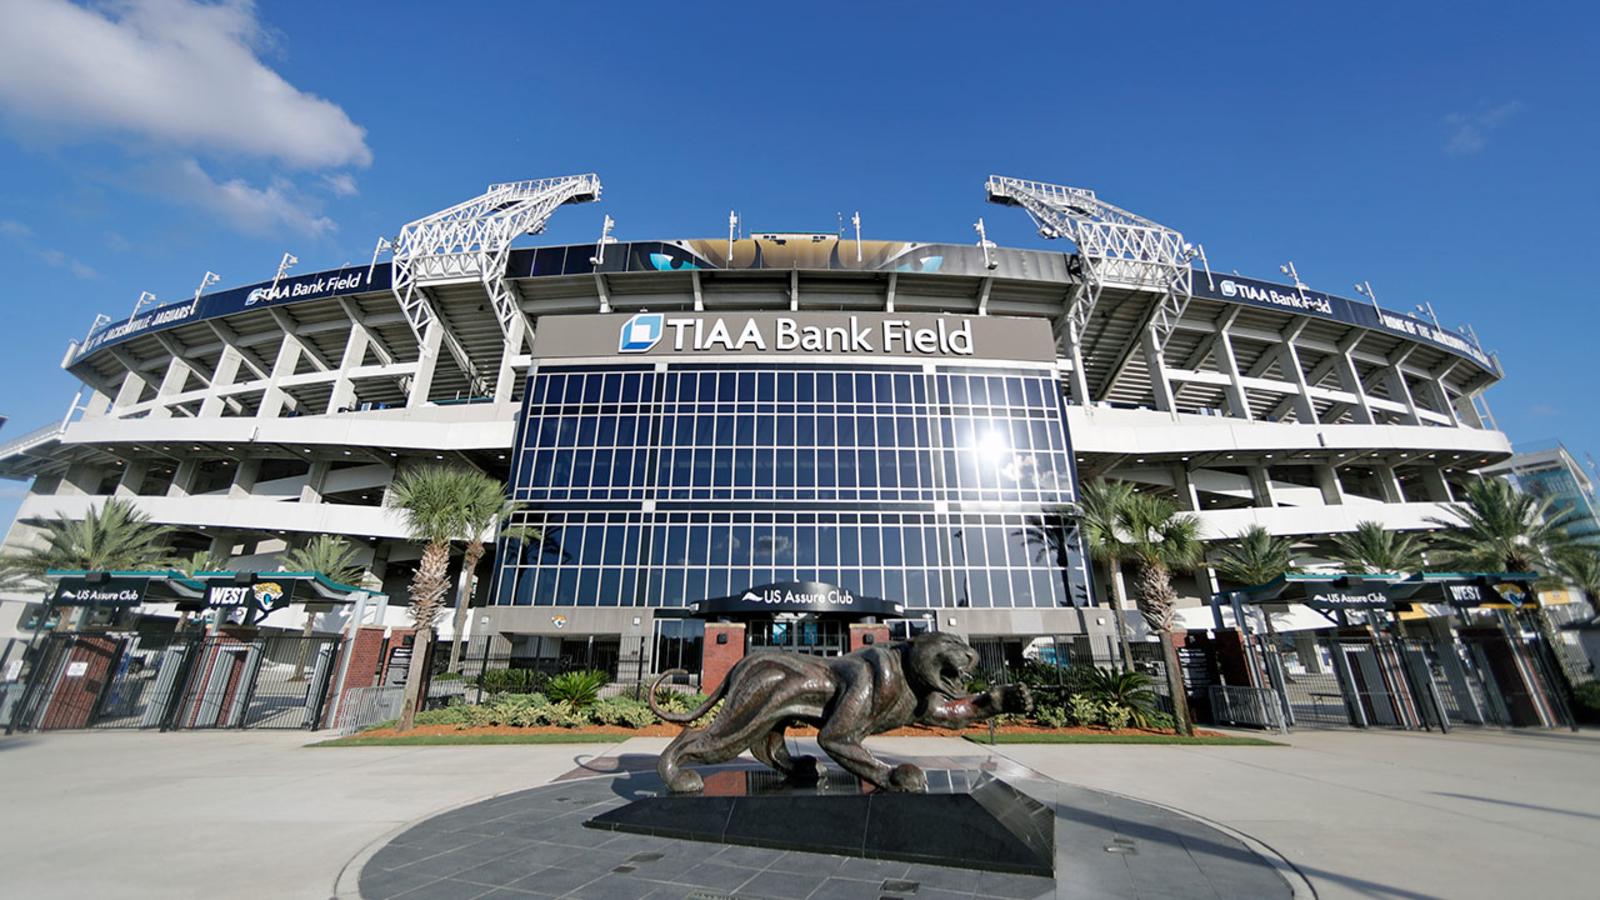 6 shot near stadium during Texans-Jaguars game in Jacksonville - ABC13 Houston